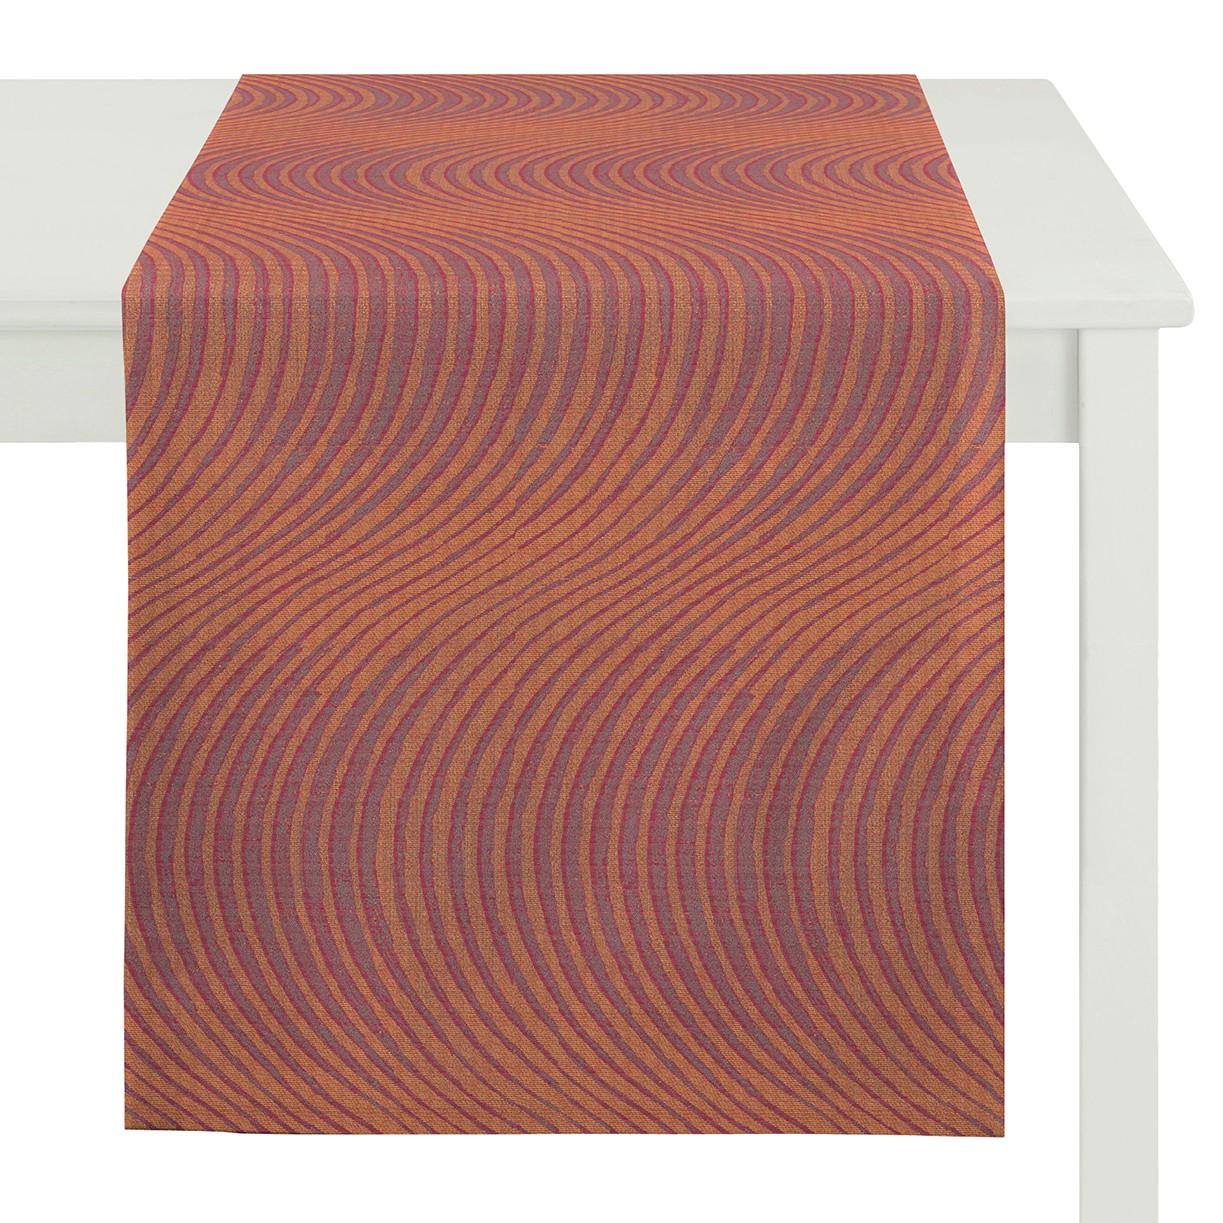 Tafelloper Topa - geweven stof - Barnsteenkleurig, Apelt